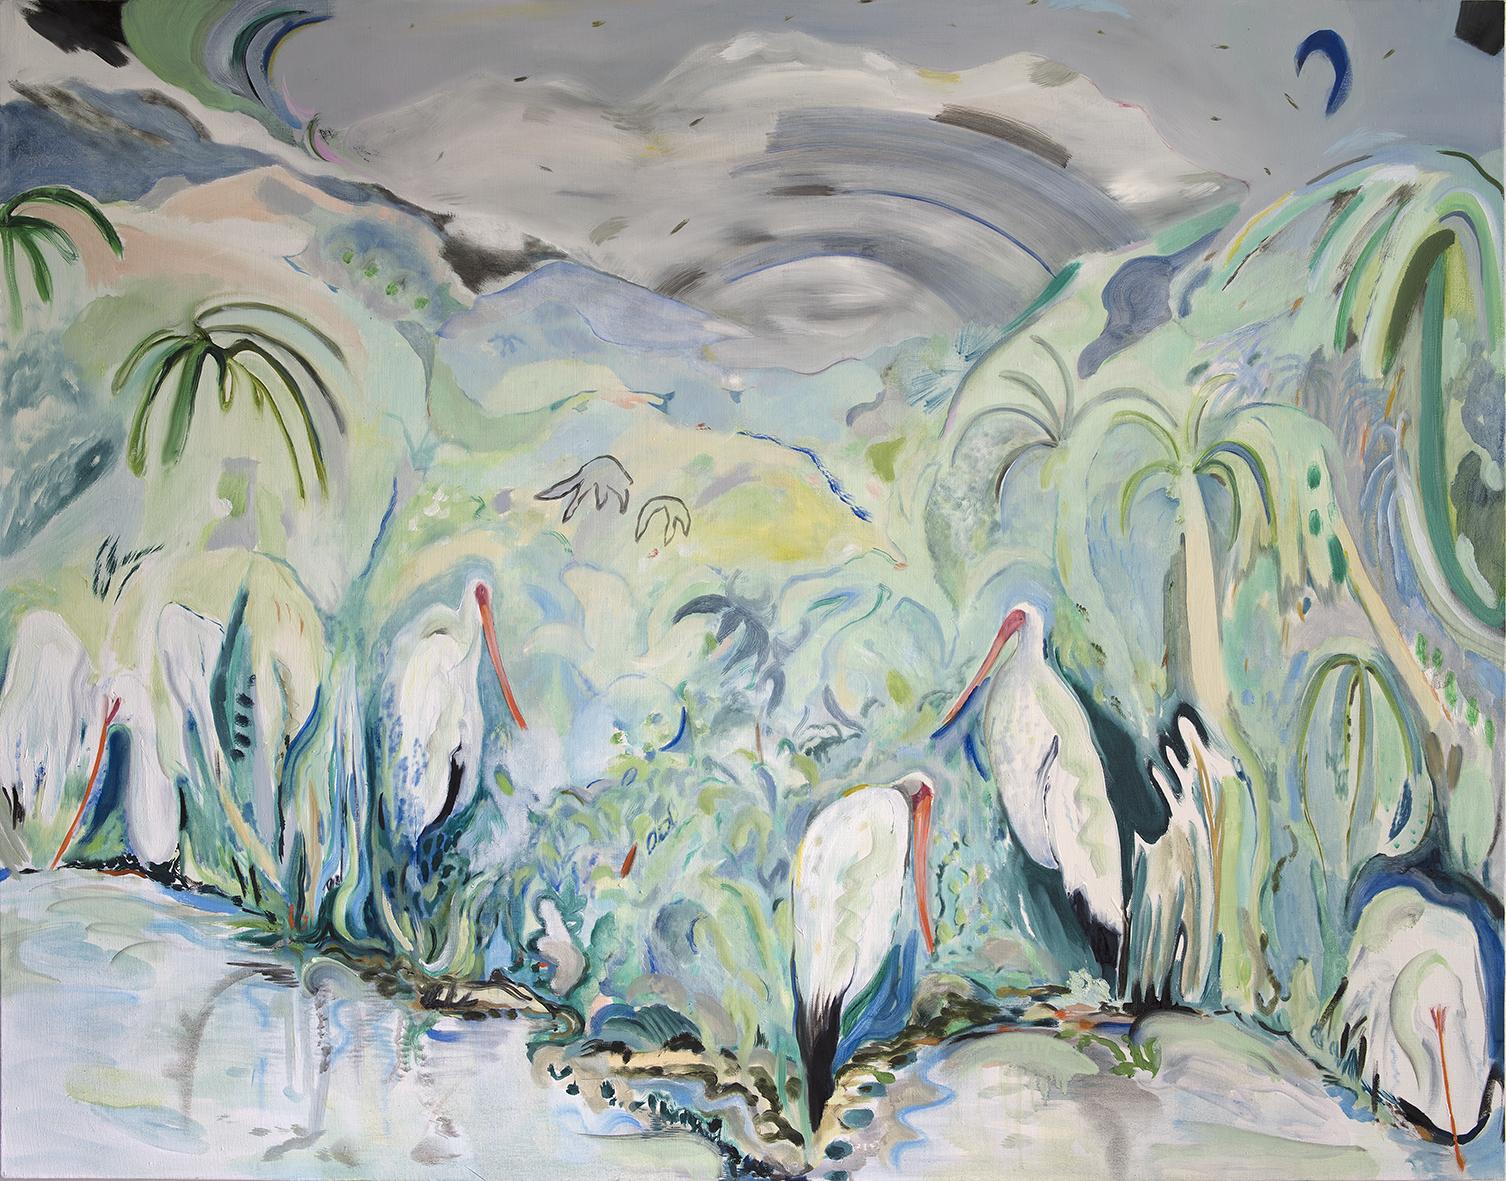 Vera Portatadino, A Bunch of Lonesome Heroes, 2016, olio su tela, 120 x 153 cm